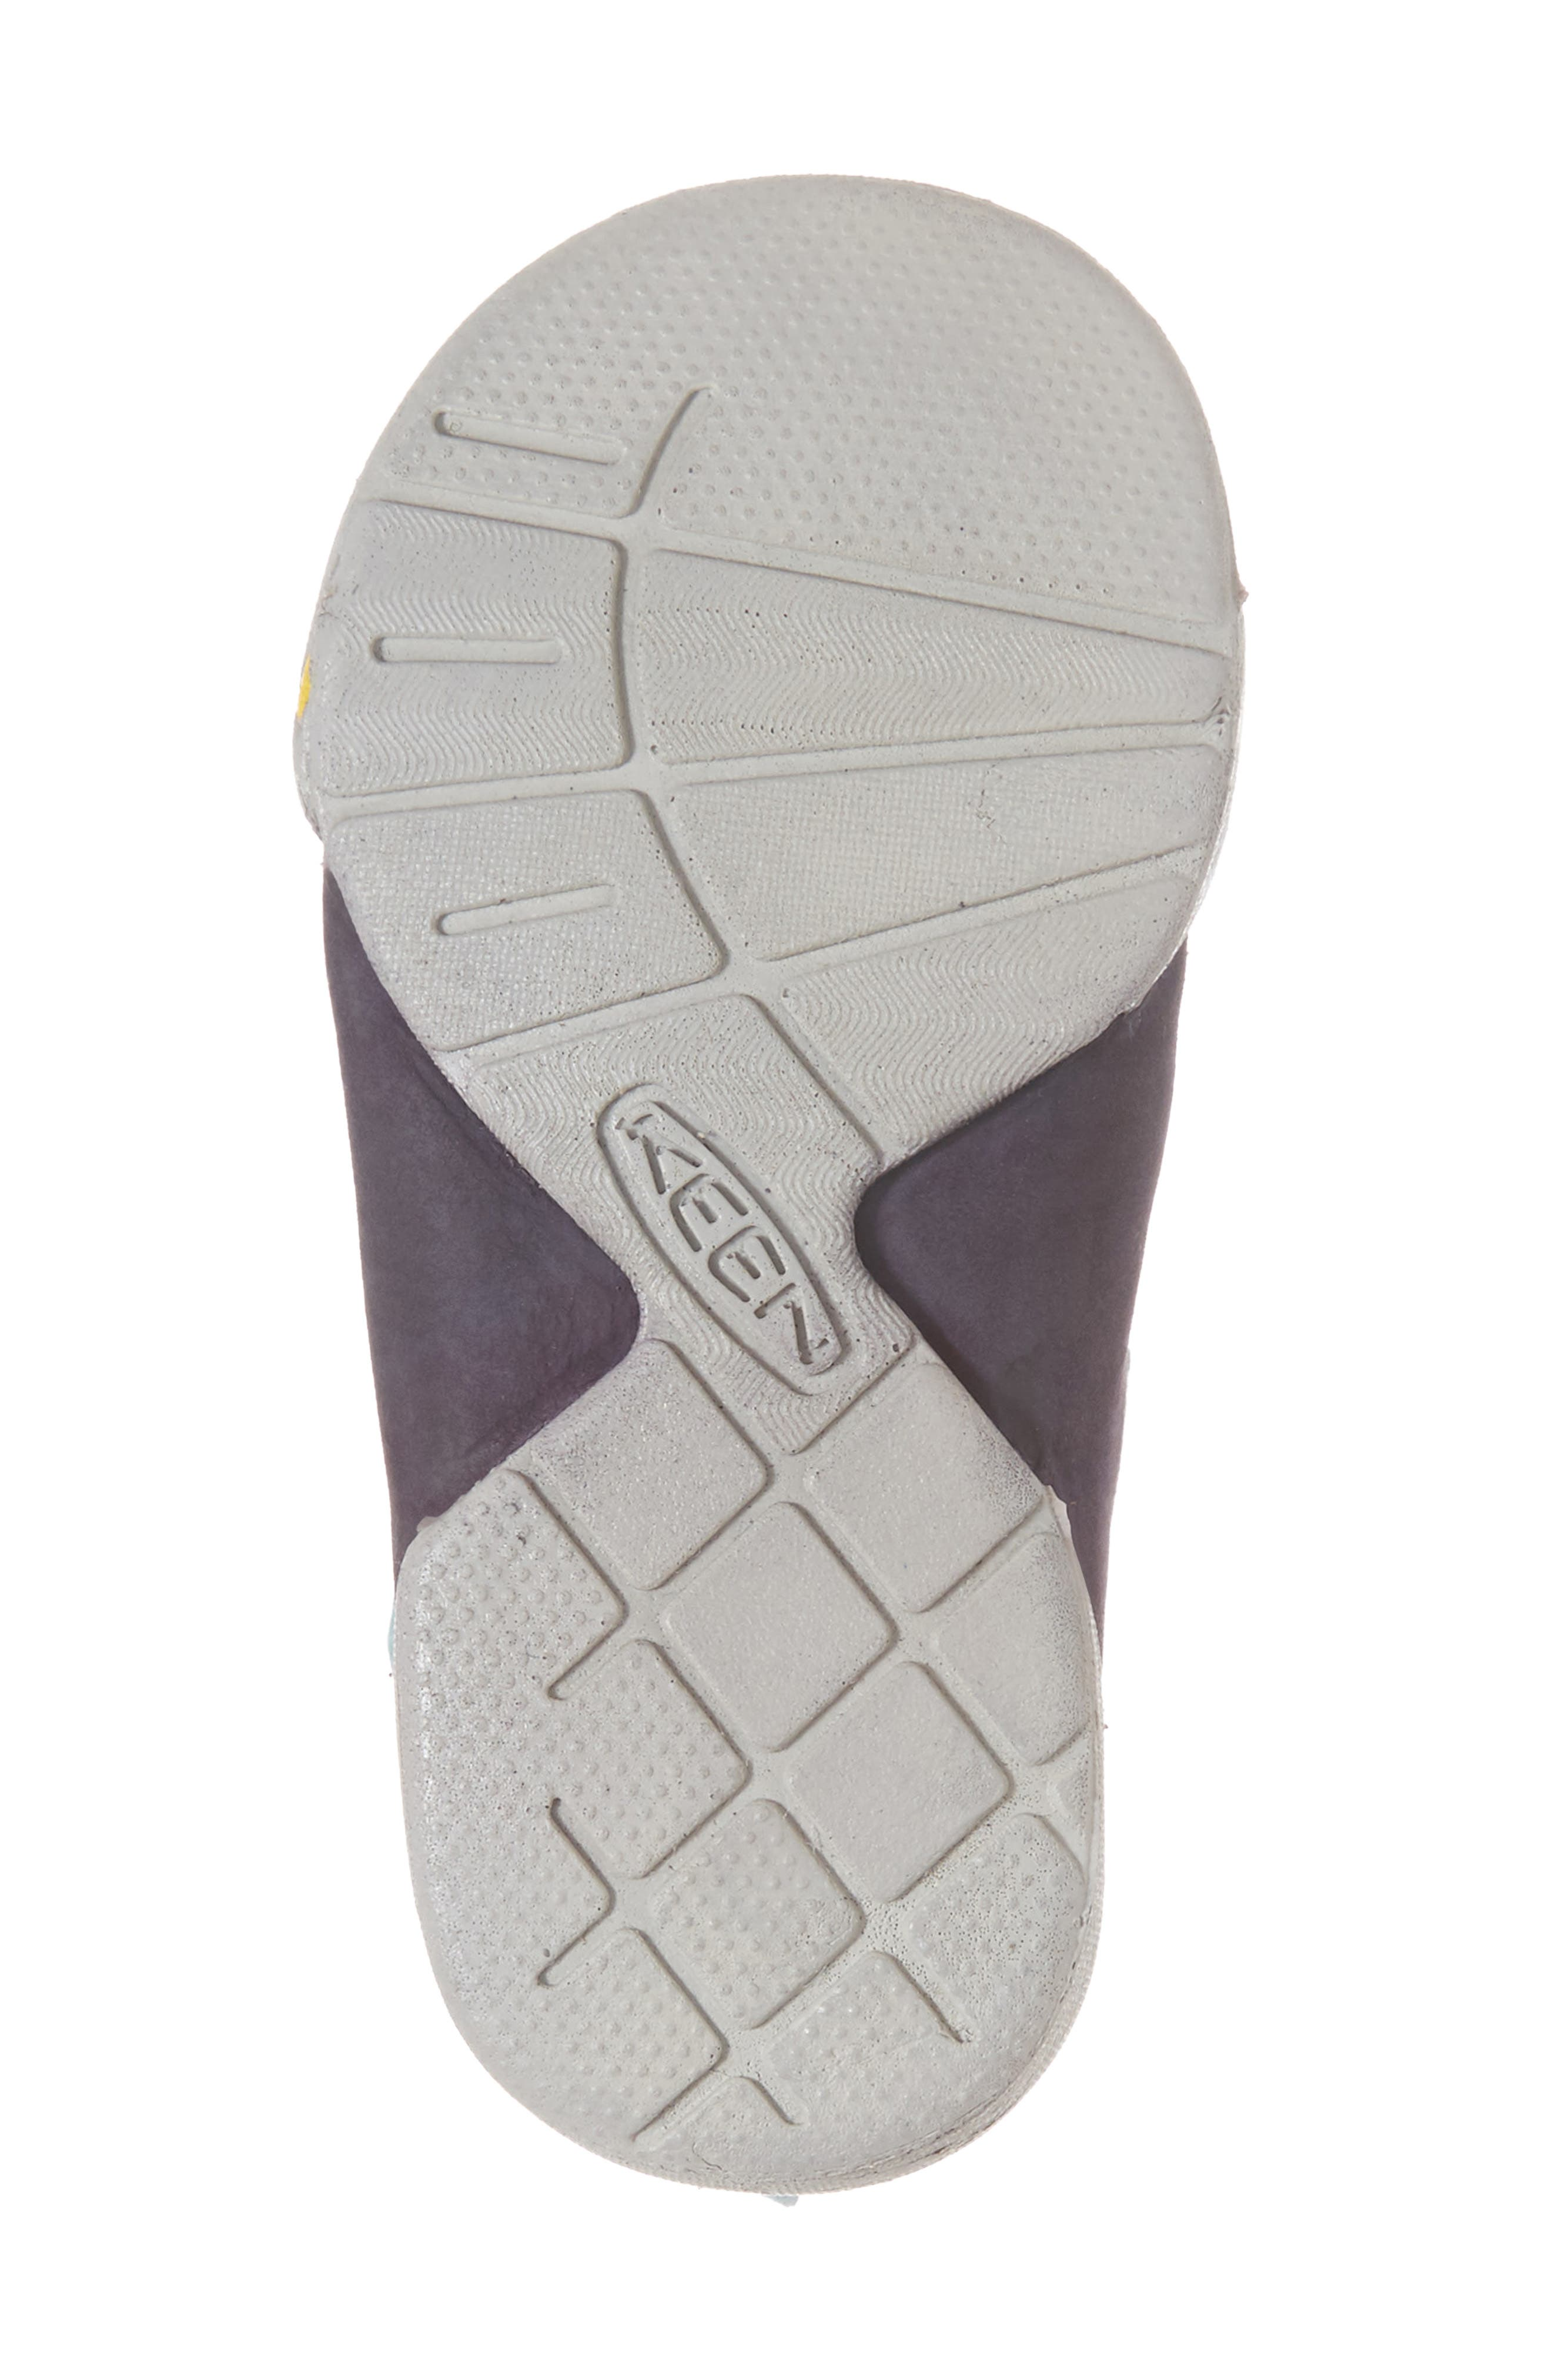 Pep Mid-T Sneaker,                             Alternate thumbnail 6, color,                             Plumeria/ Sweet Lavendar